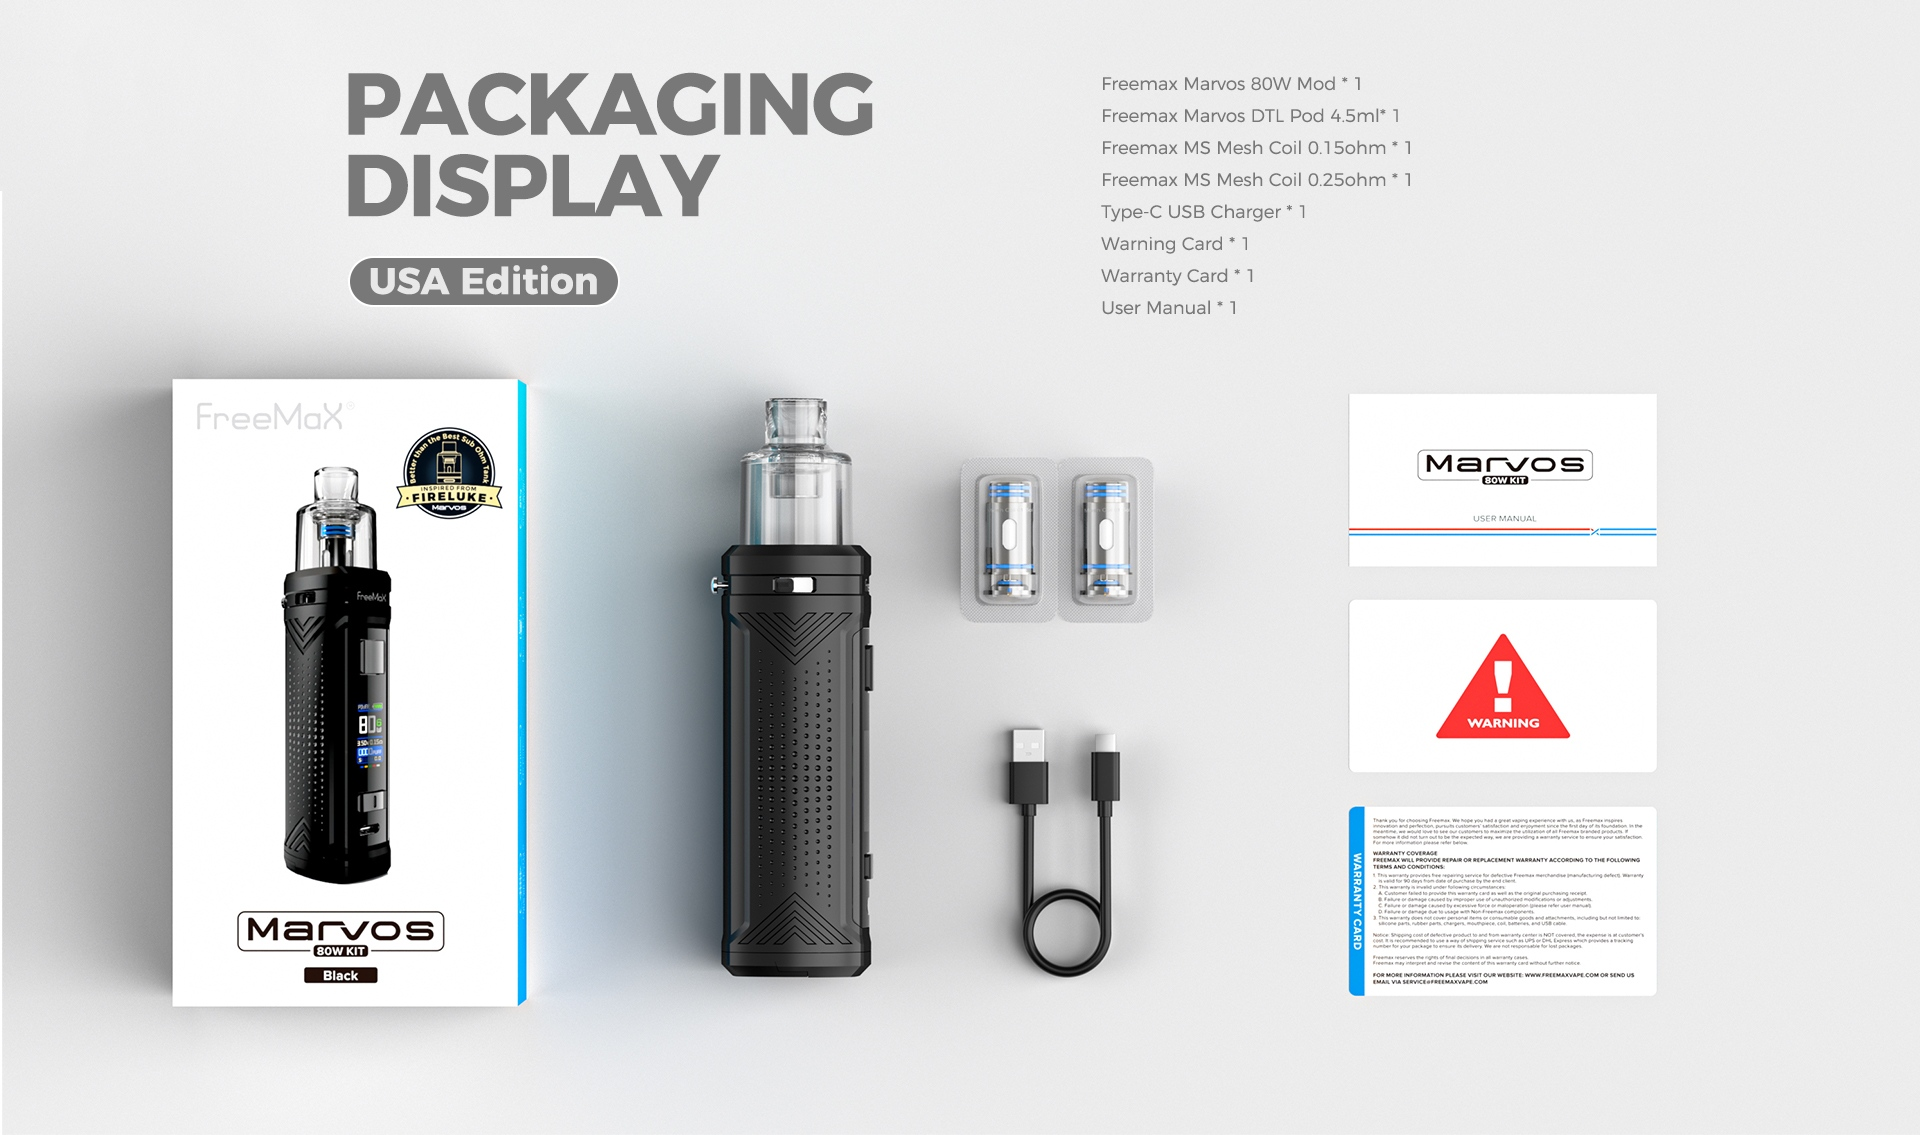 Marvos 80W - Packaging Display(US Edition)